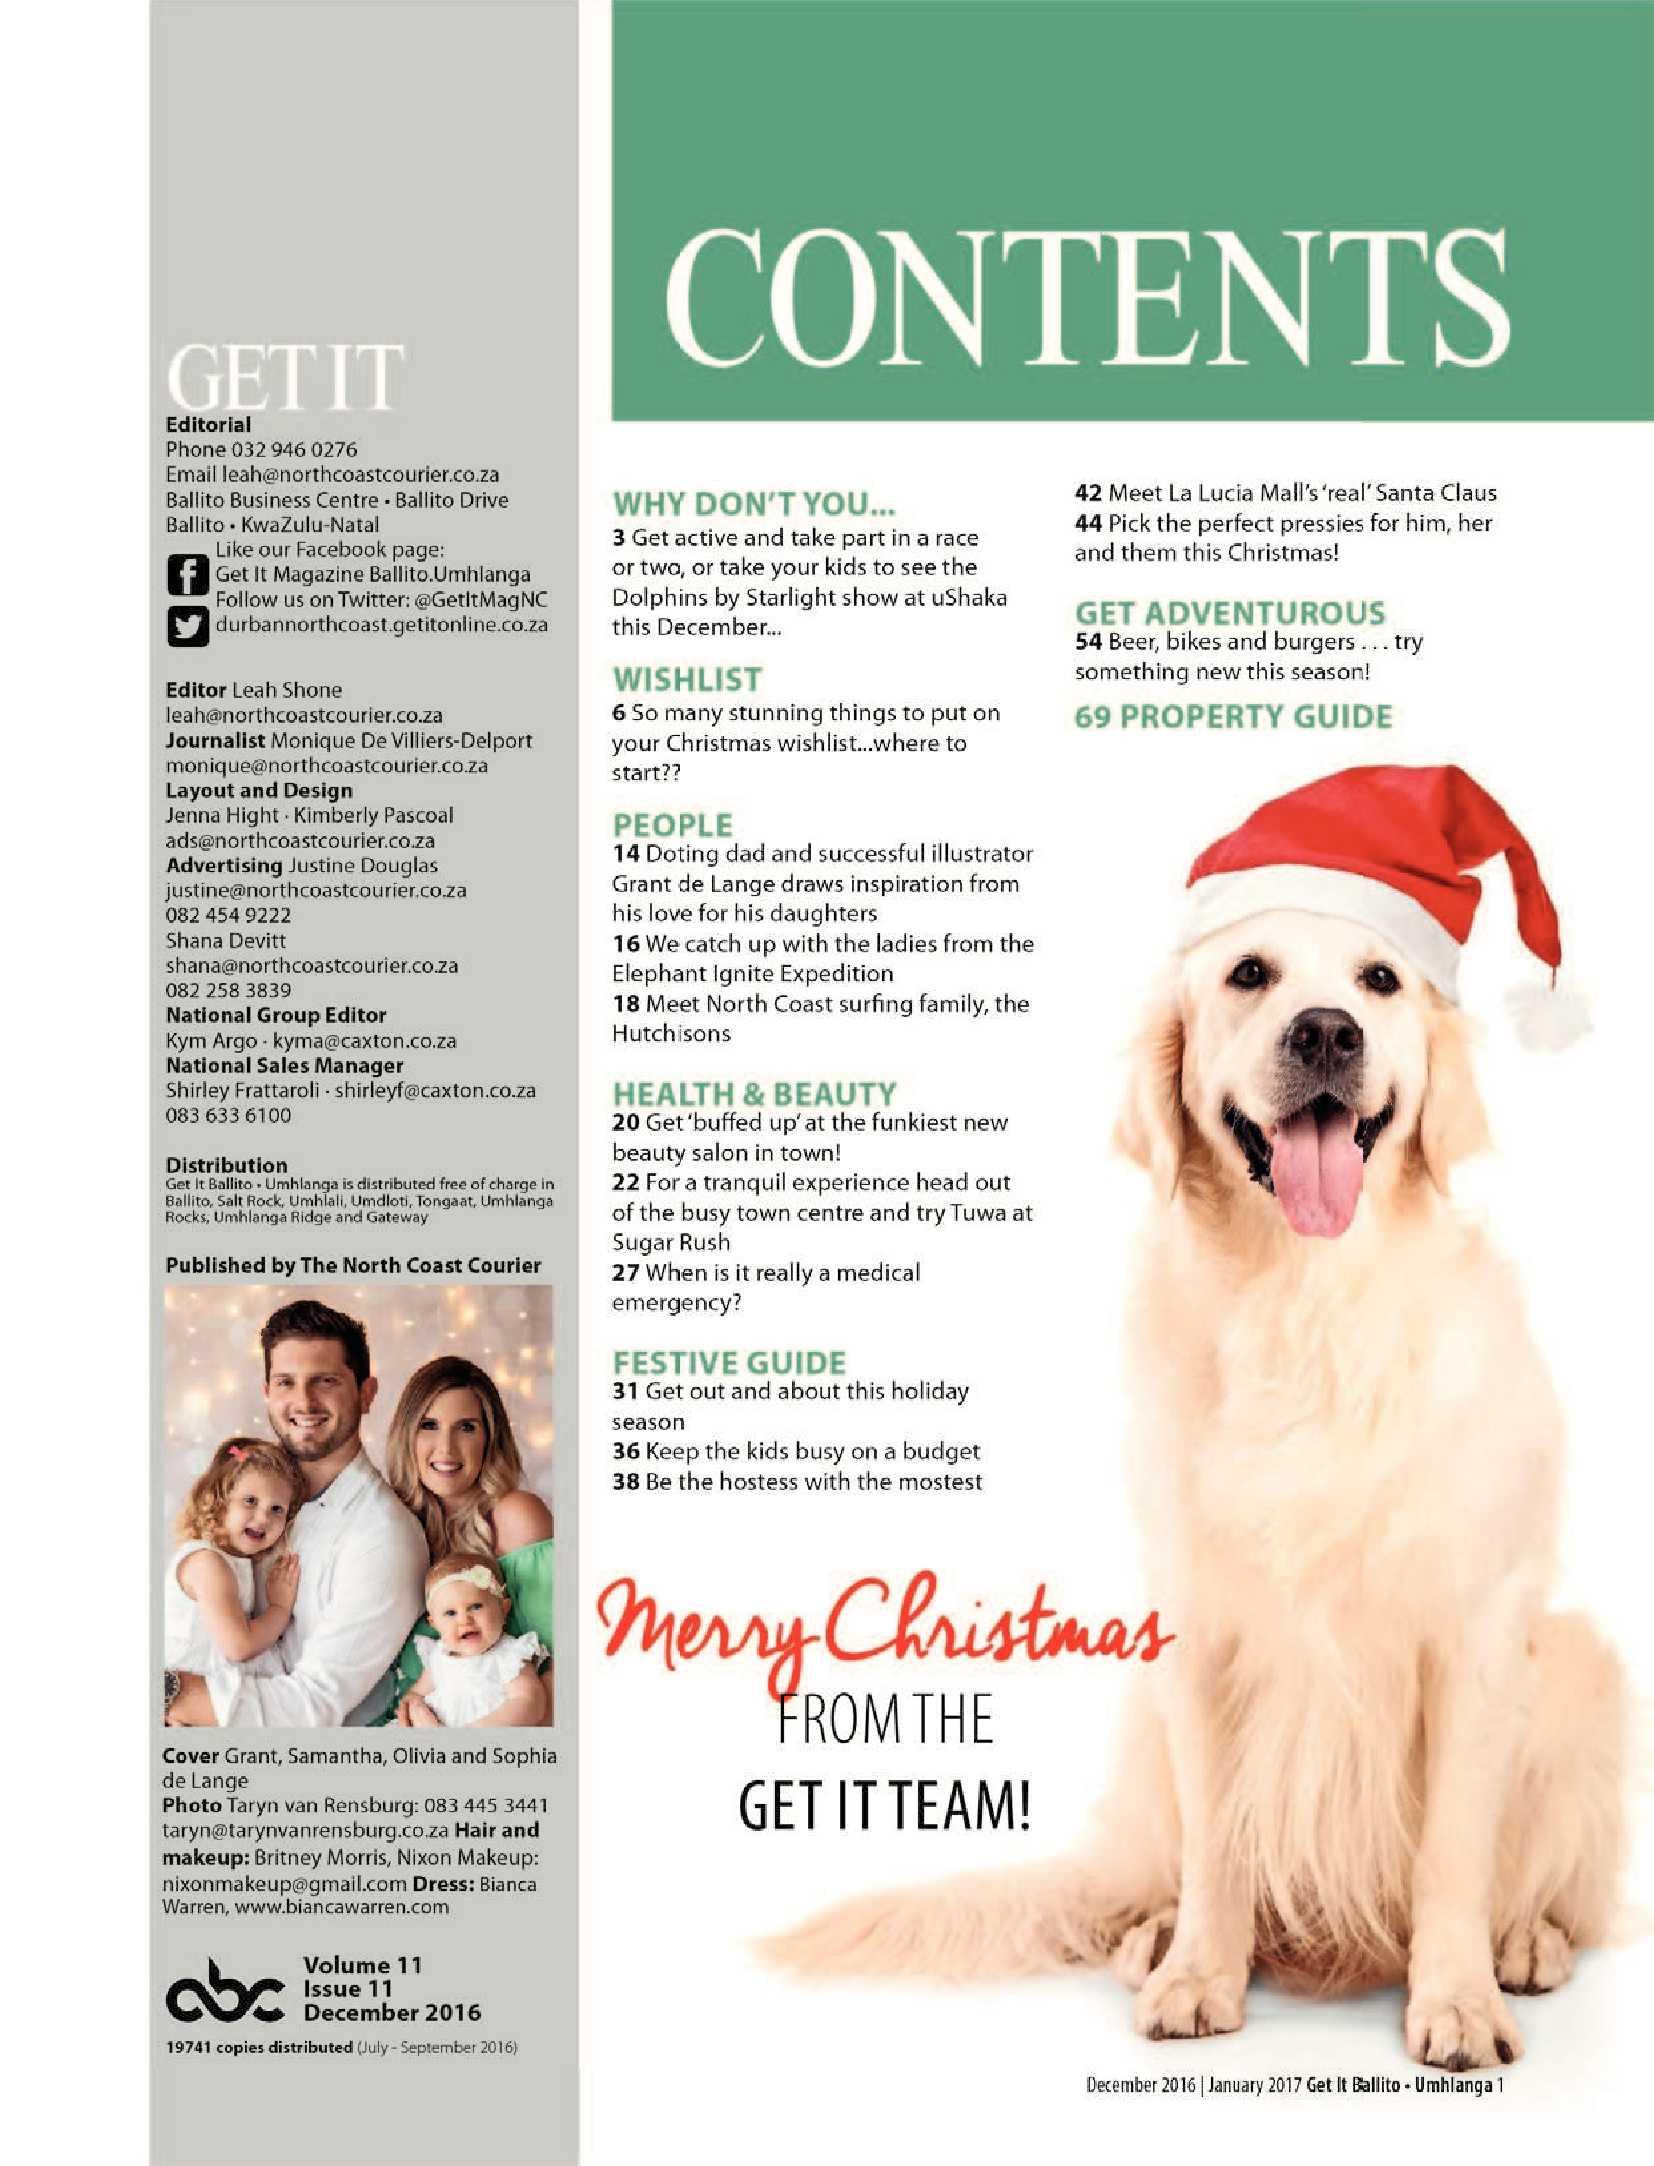 get-magazine-ballitoumhlanga-december-2016-january-2017-epapers-page-3